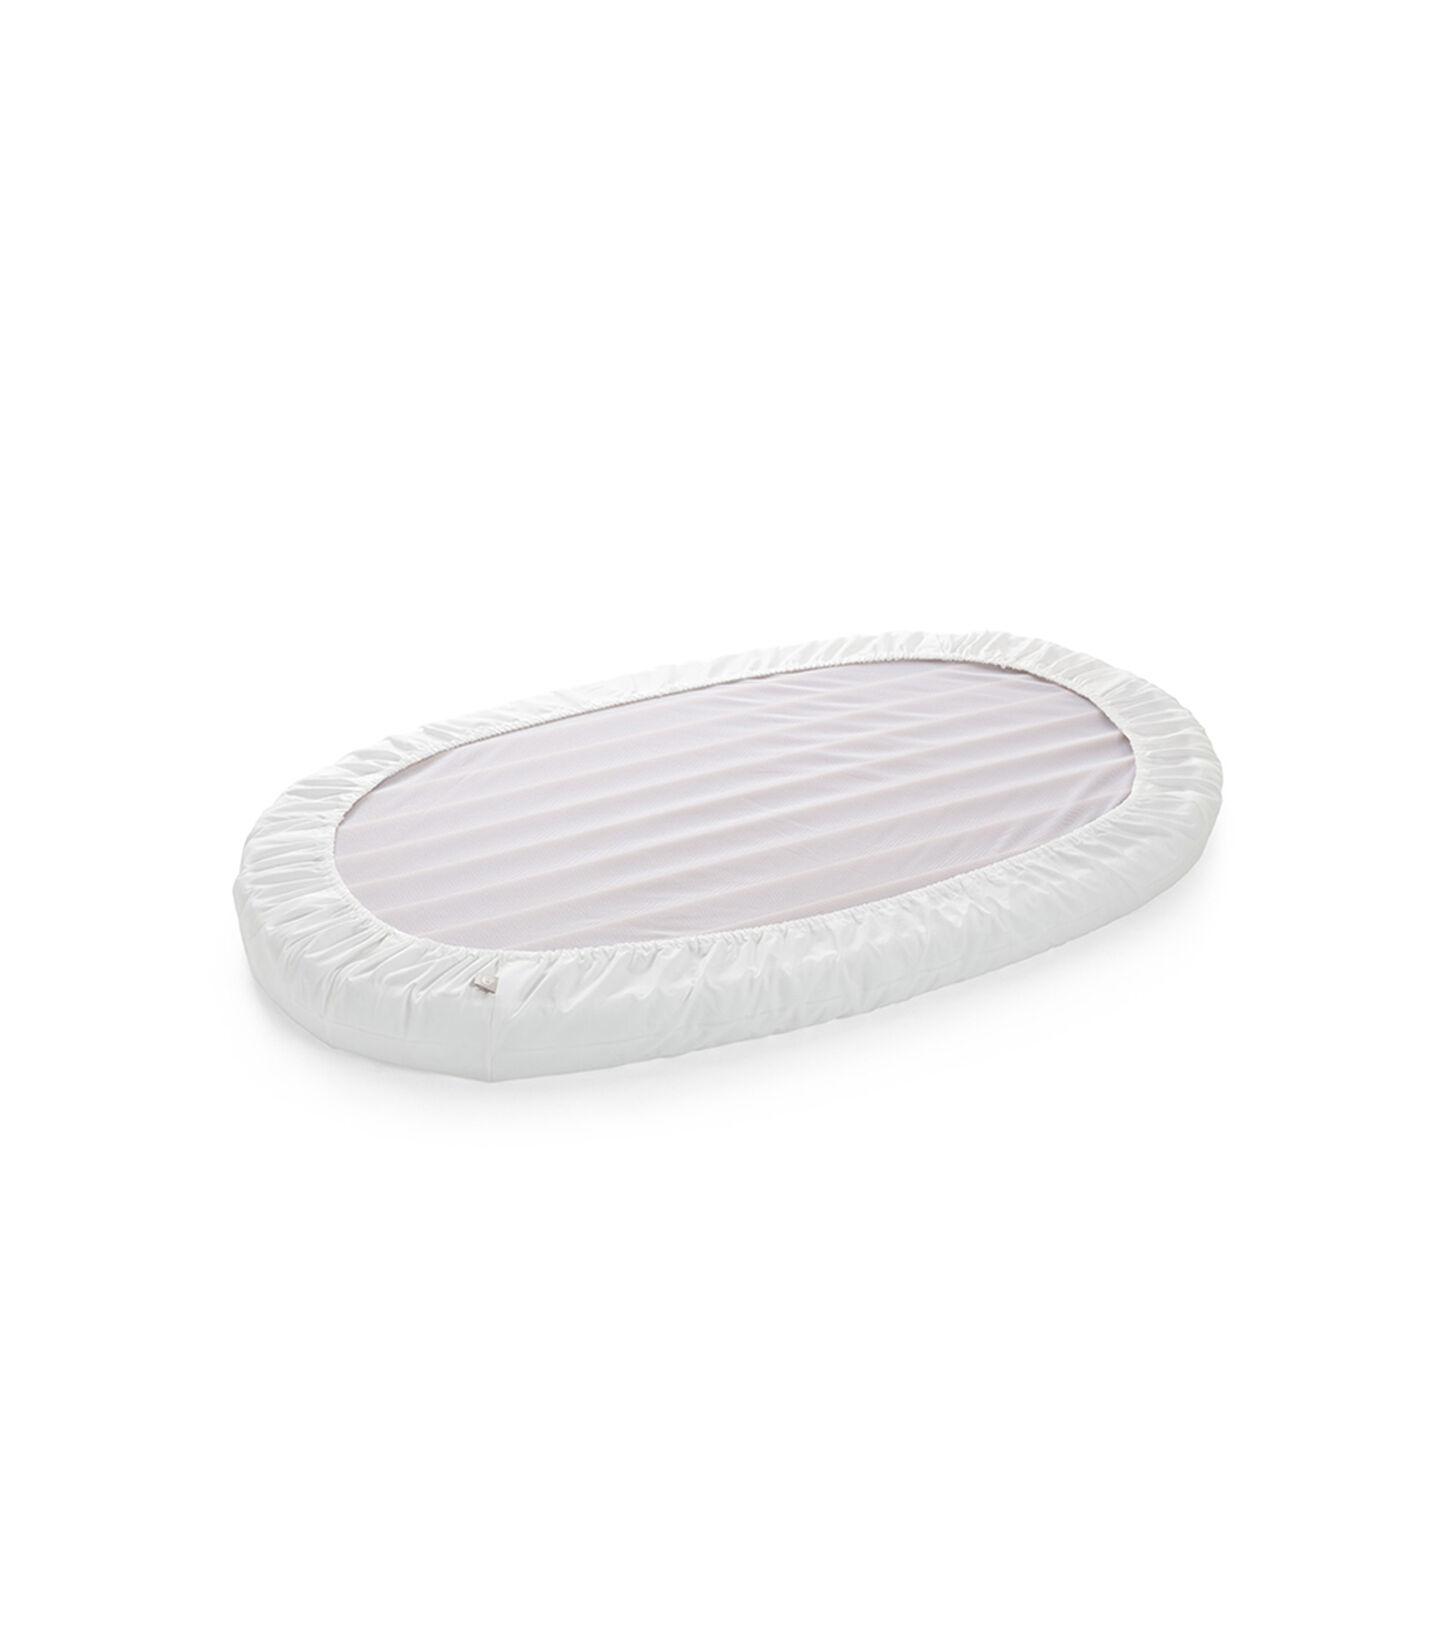 Stokke® Sleepi™ Formsyet lagen White, White, mainview view 2